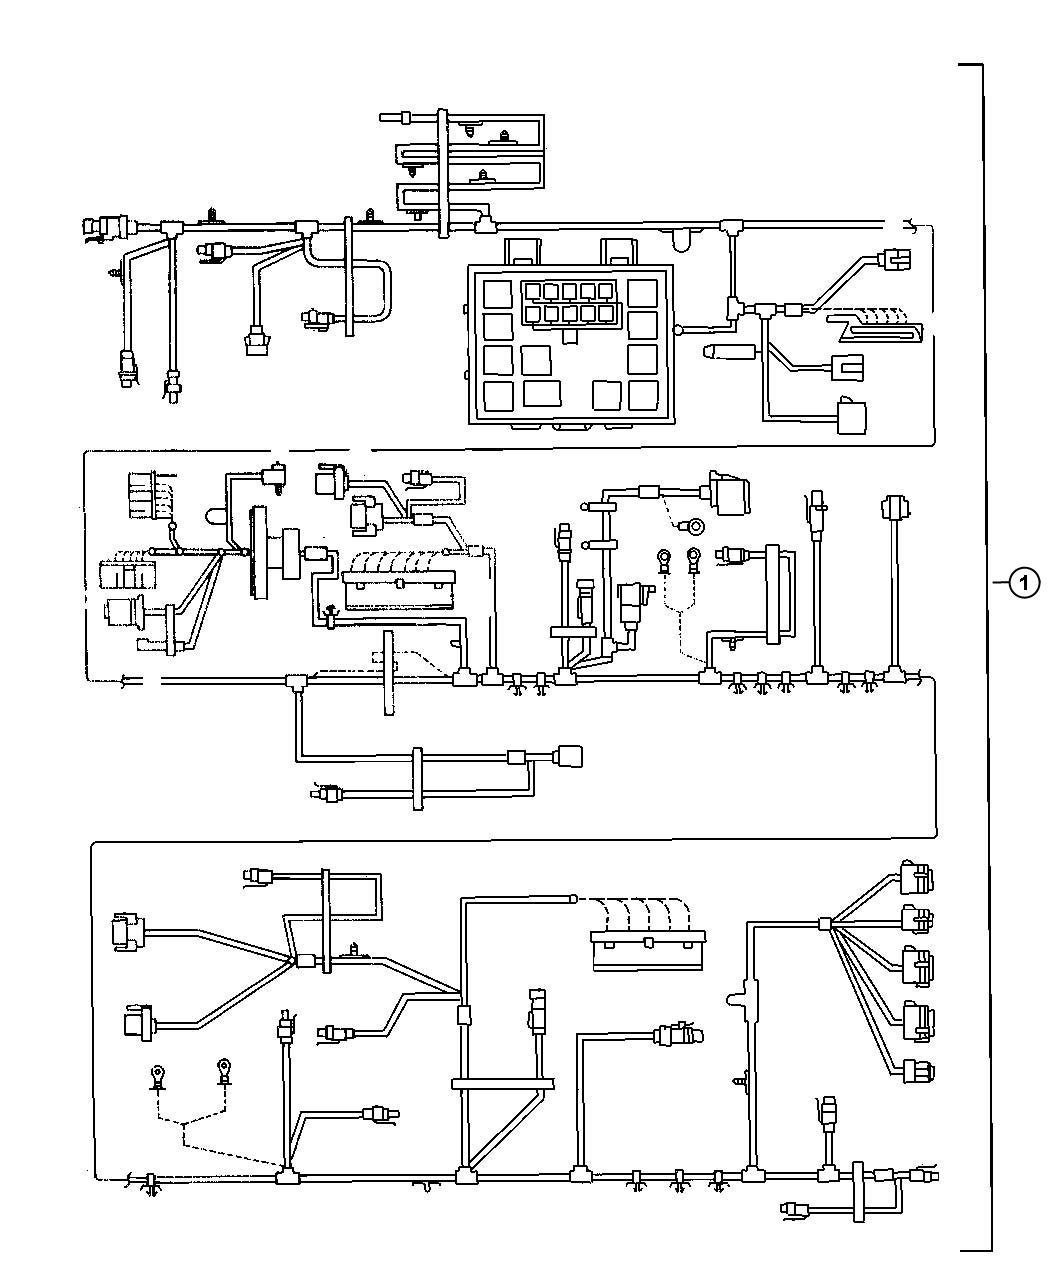 Dodge Sprinter Strap Tie 4 8x151 Mm Harness